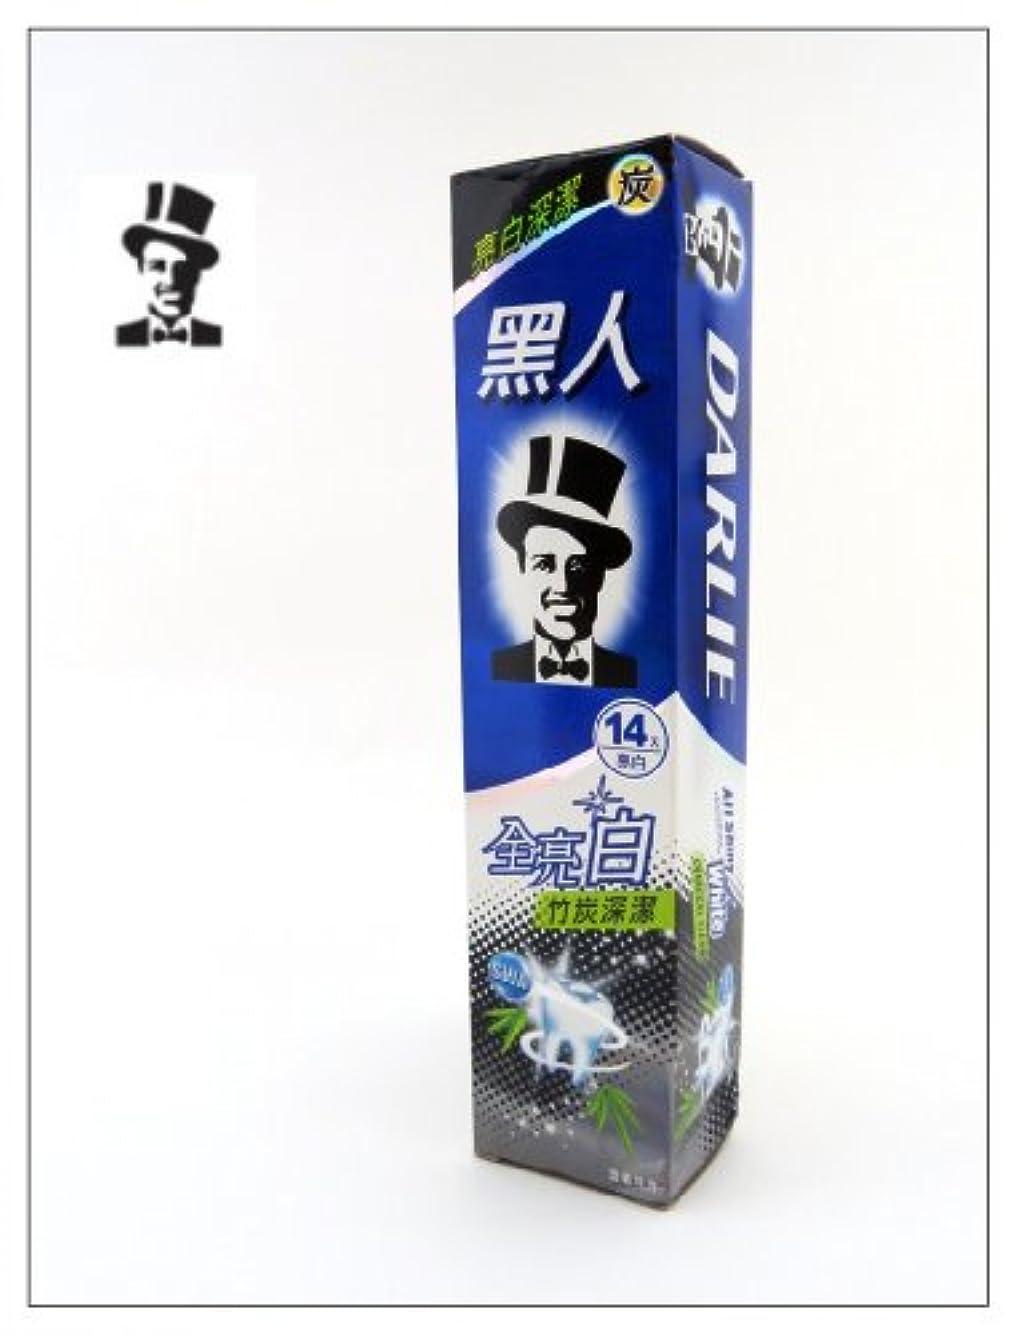 黒人 歯磨き 全亮白竹炭深潔 140g 台湾製